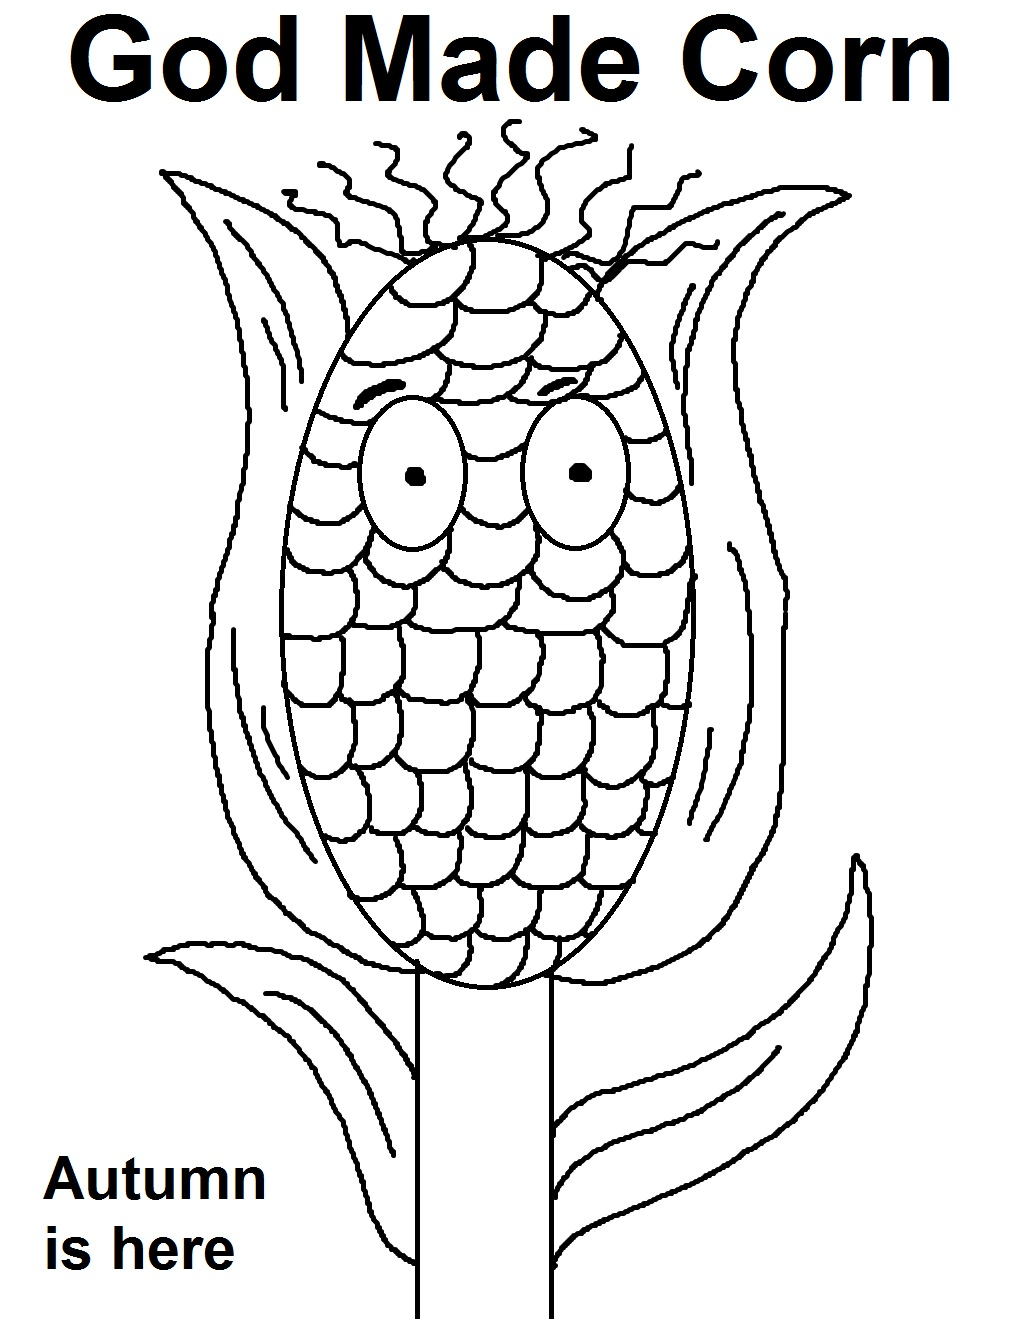 Corn Sunday School Lesson